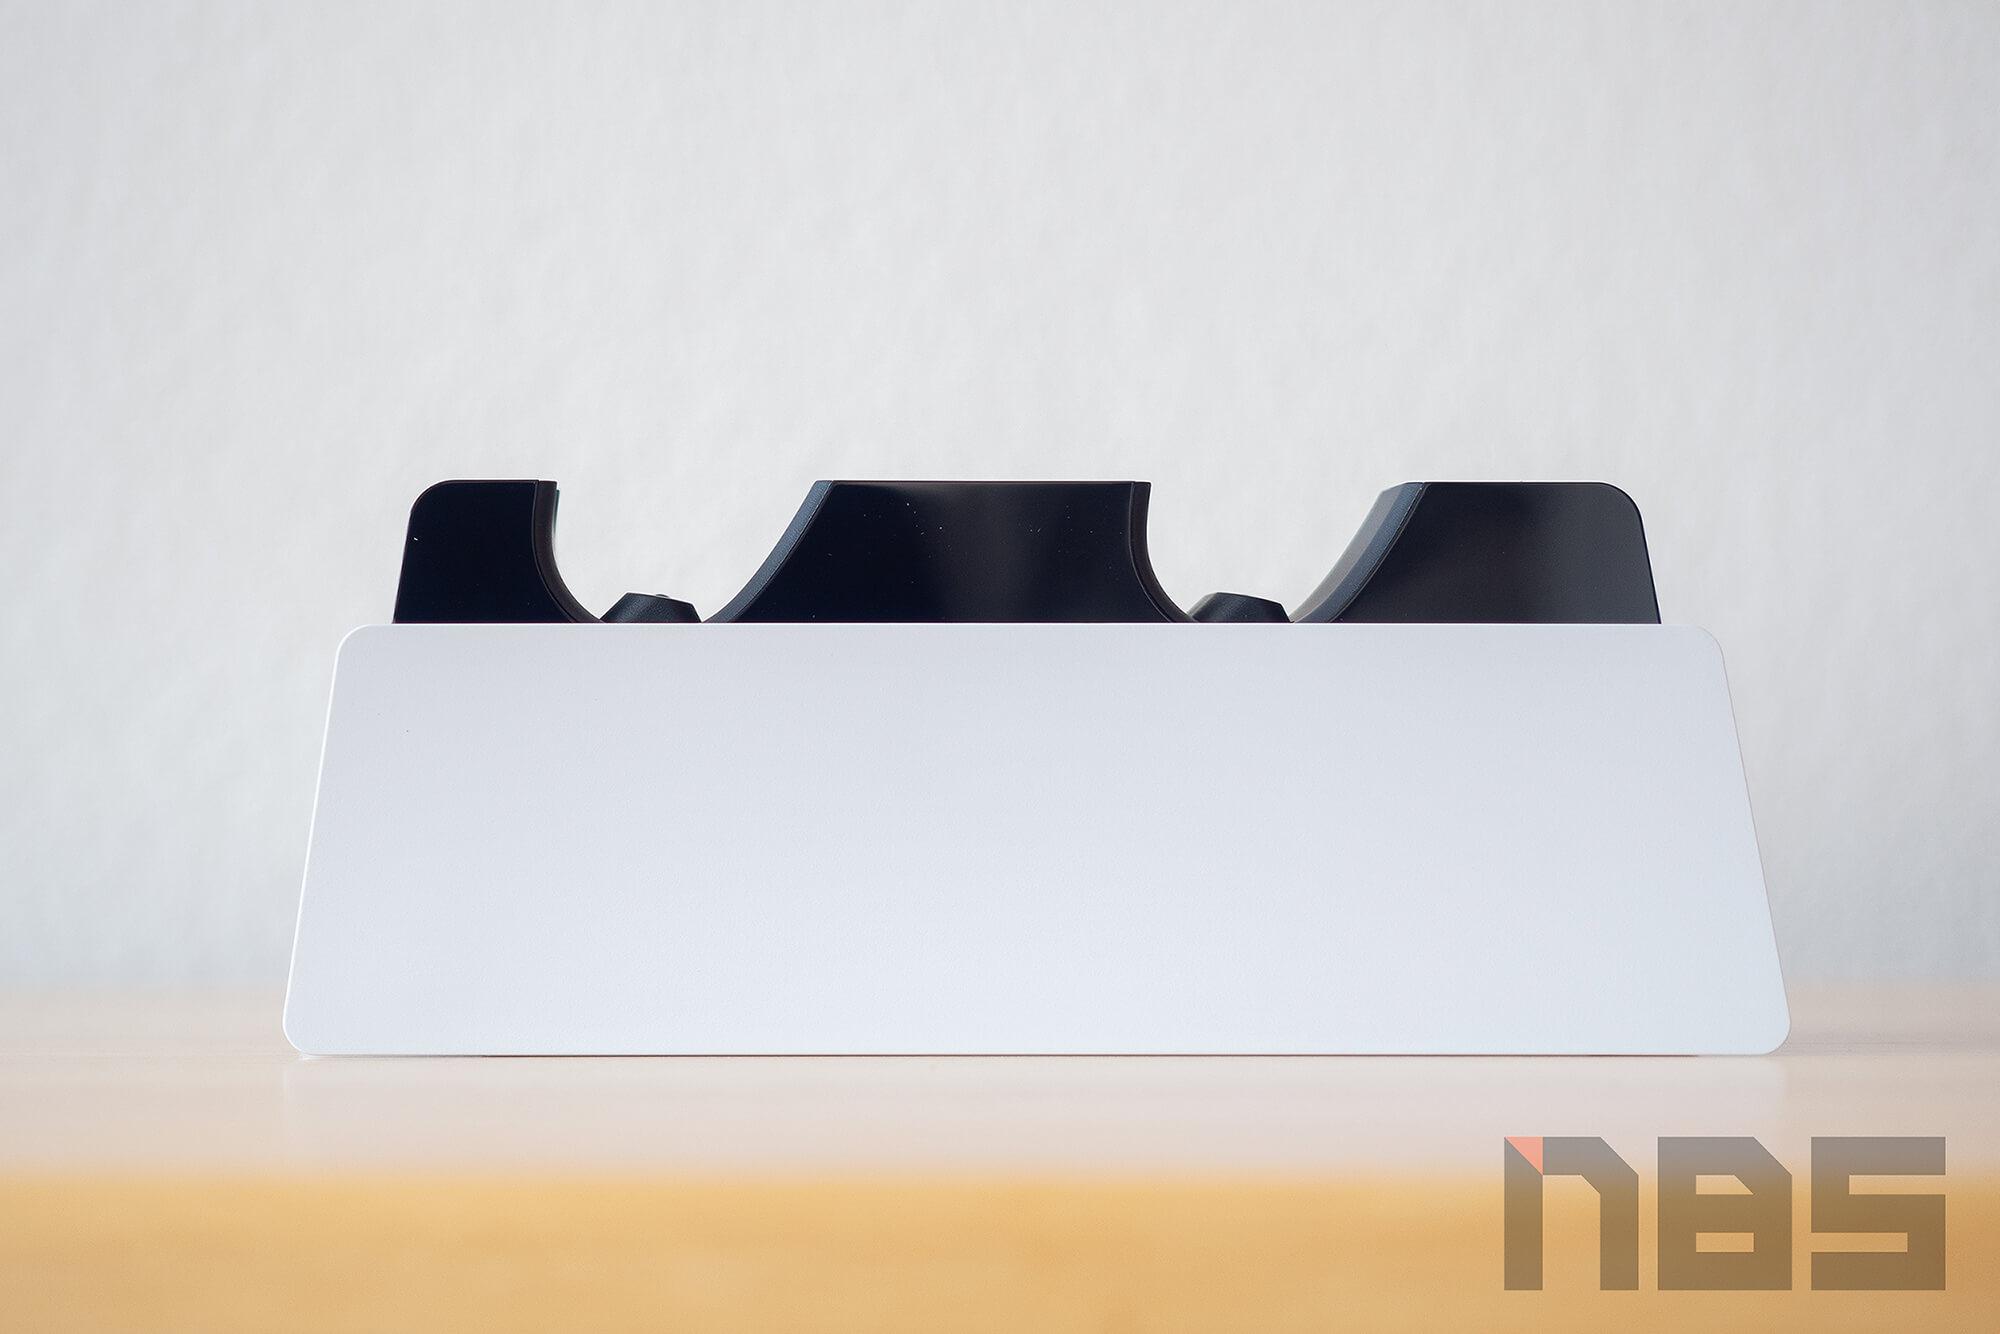 Review PlayStation 5 DualSense Charging Station NotebookSPEC 05